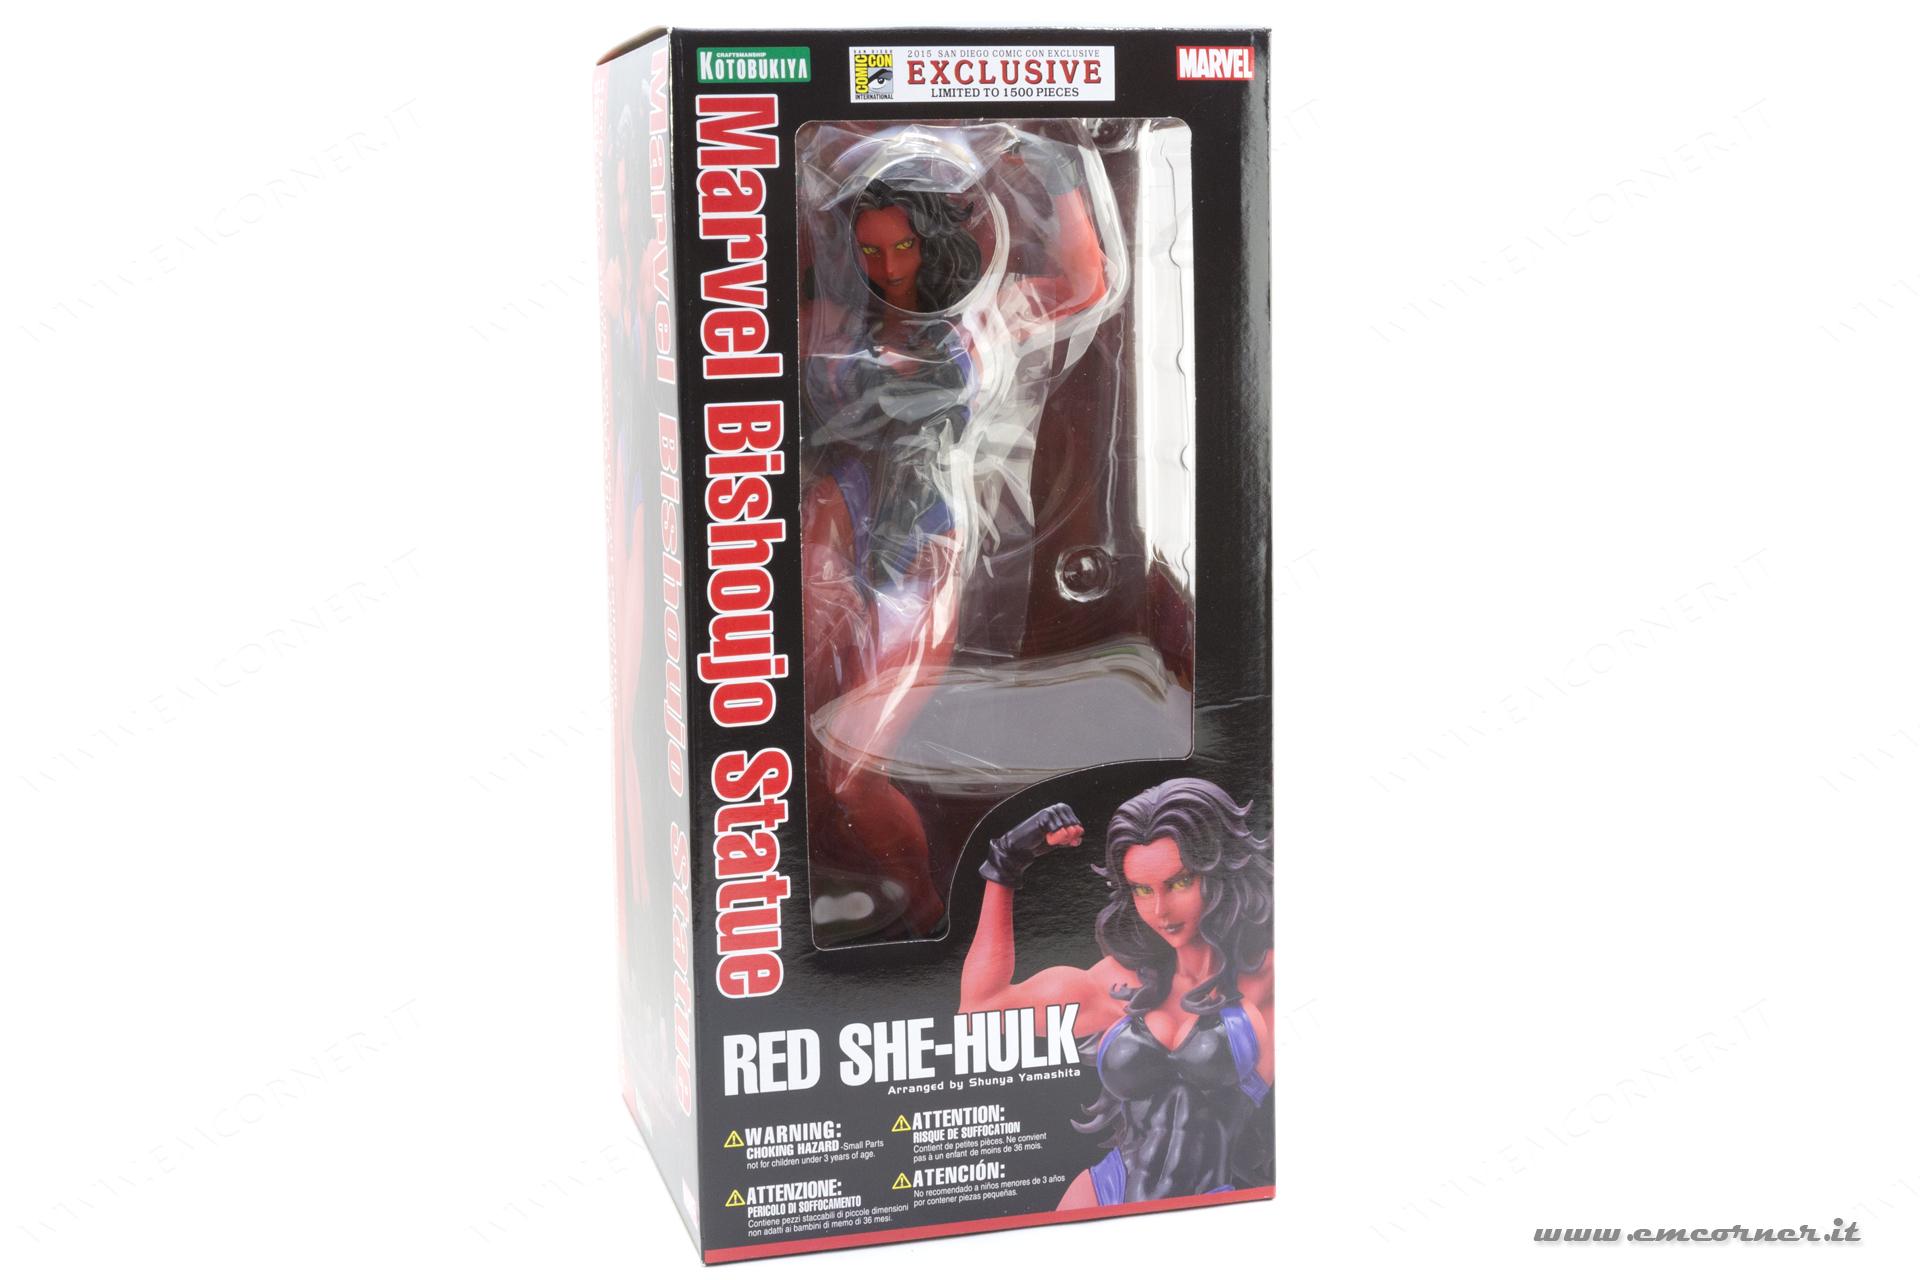 red_she_hul_kotobukiya_bishoujo_emcorner-it_-1